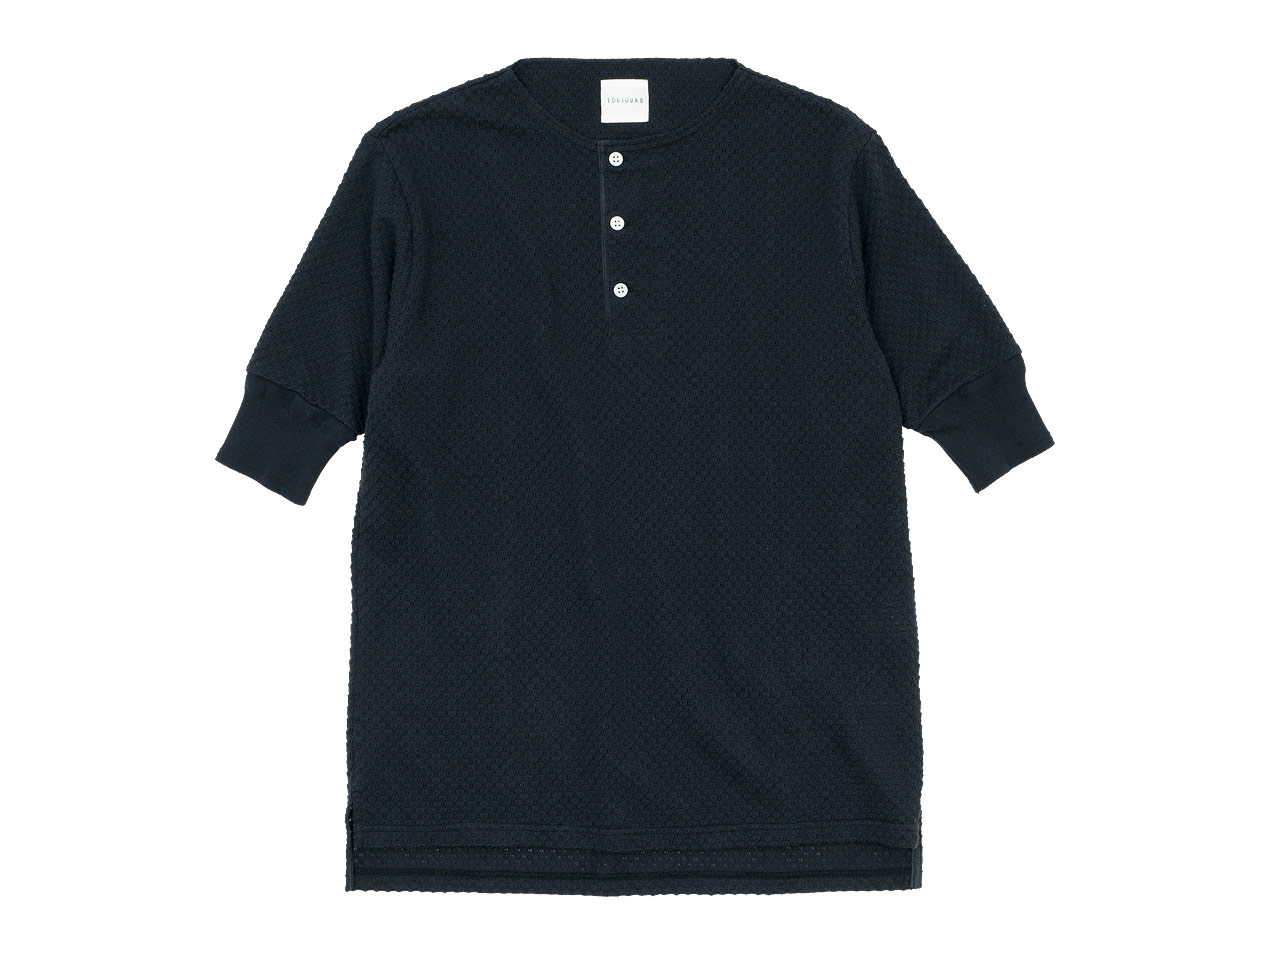 TOUJOURS Half Sleeve Henley Neck Shirt